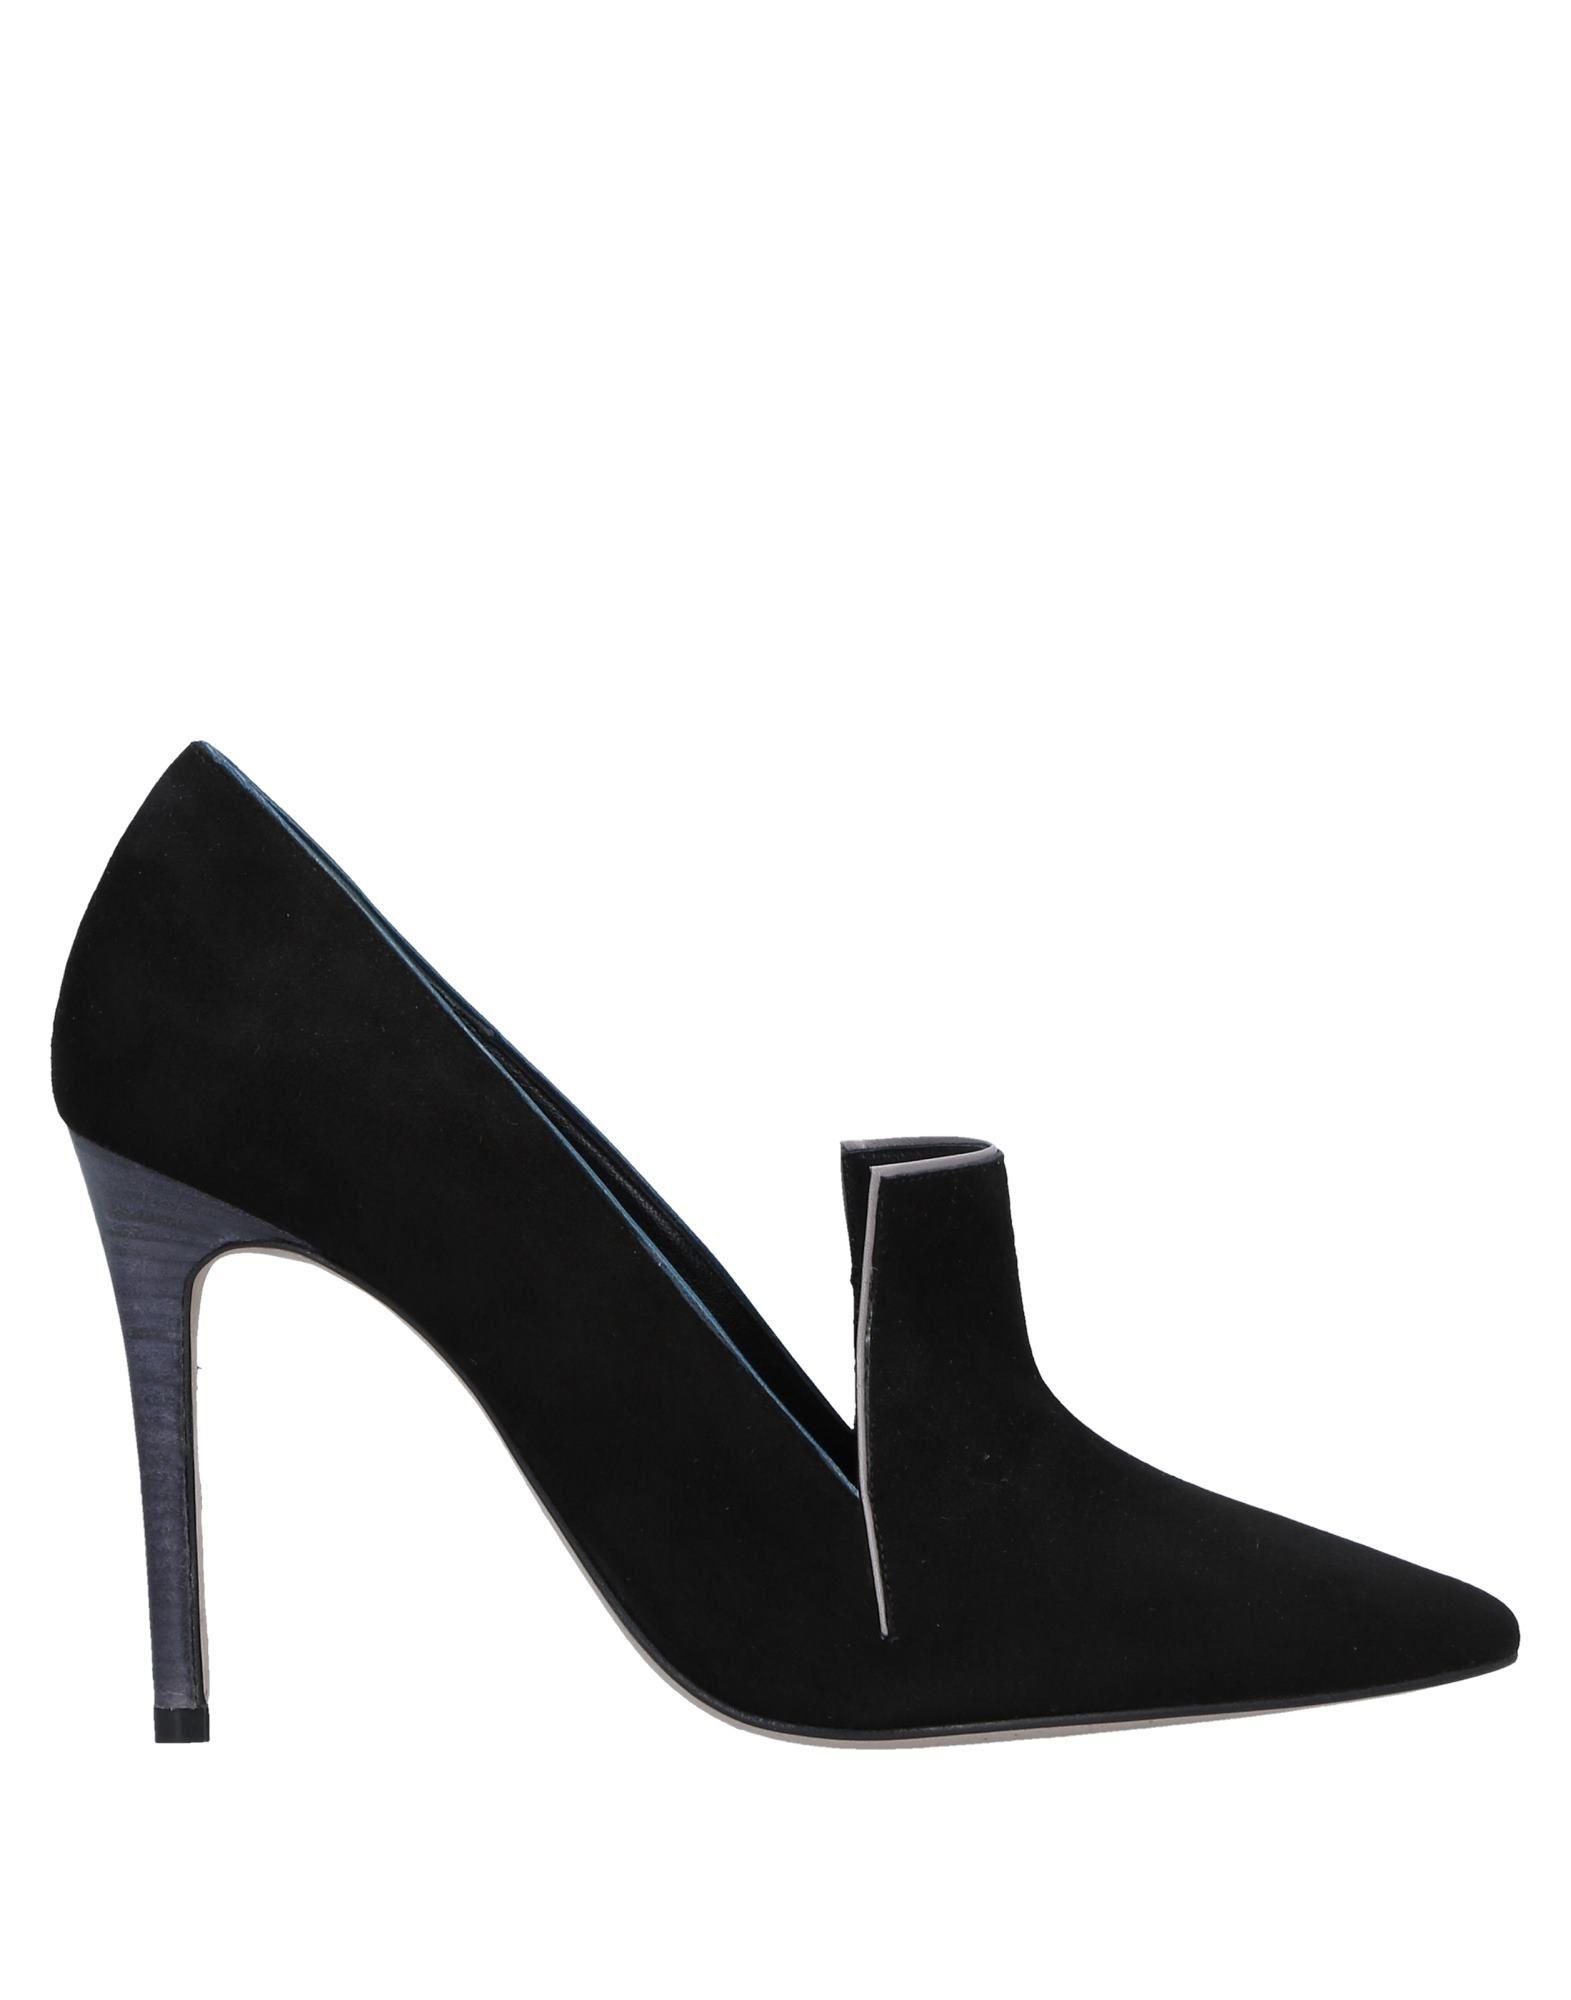 Magrit Mokassins strapazierfähige Damen  11502473TUGut aussehende strapazierfähige Mokassins Schuhe 11b536